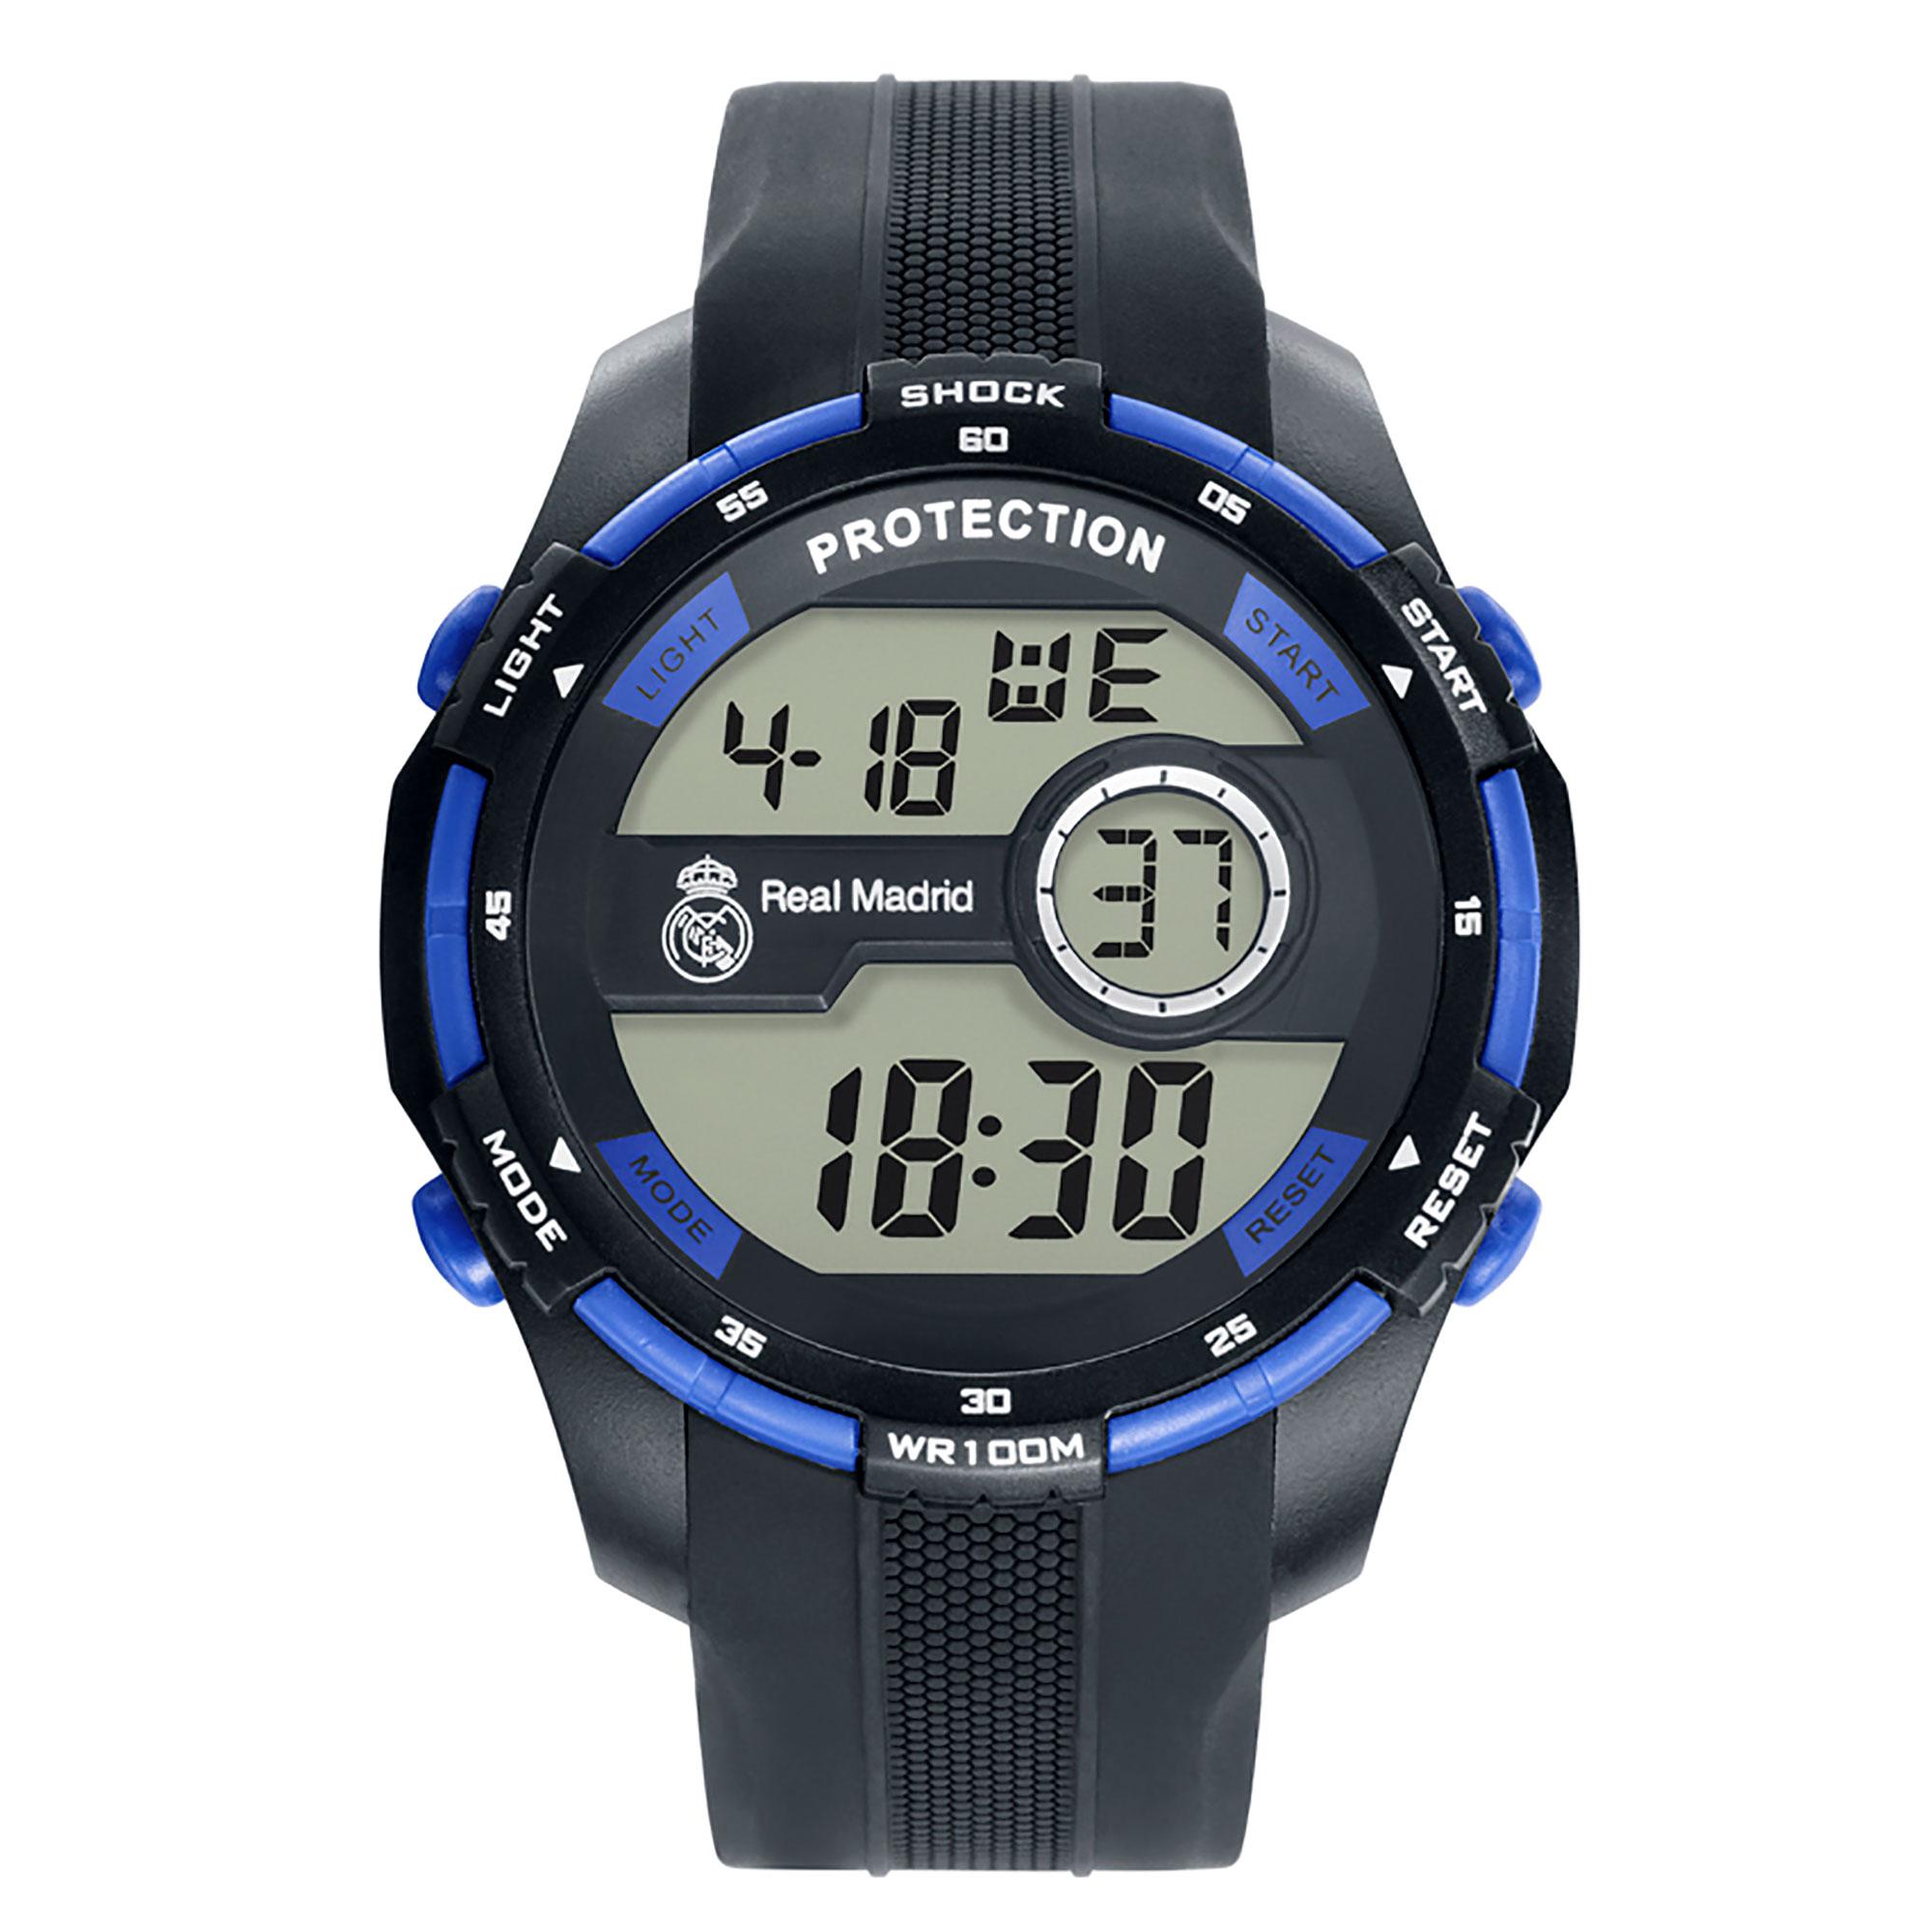 (Grupo Munreco) / Reloj digital del Real Madrid negro